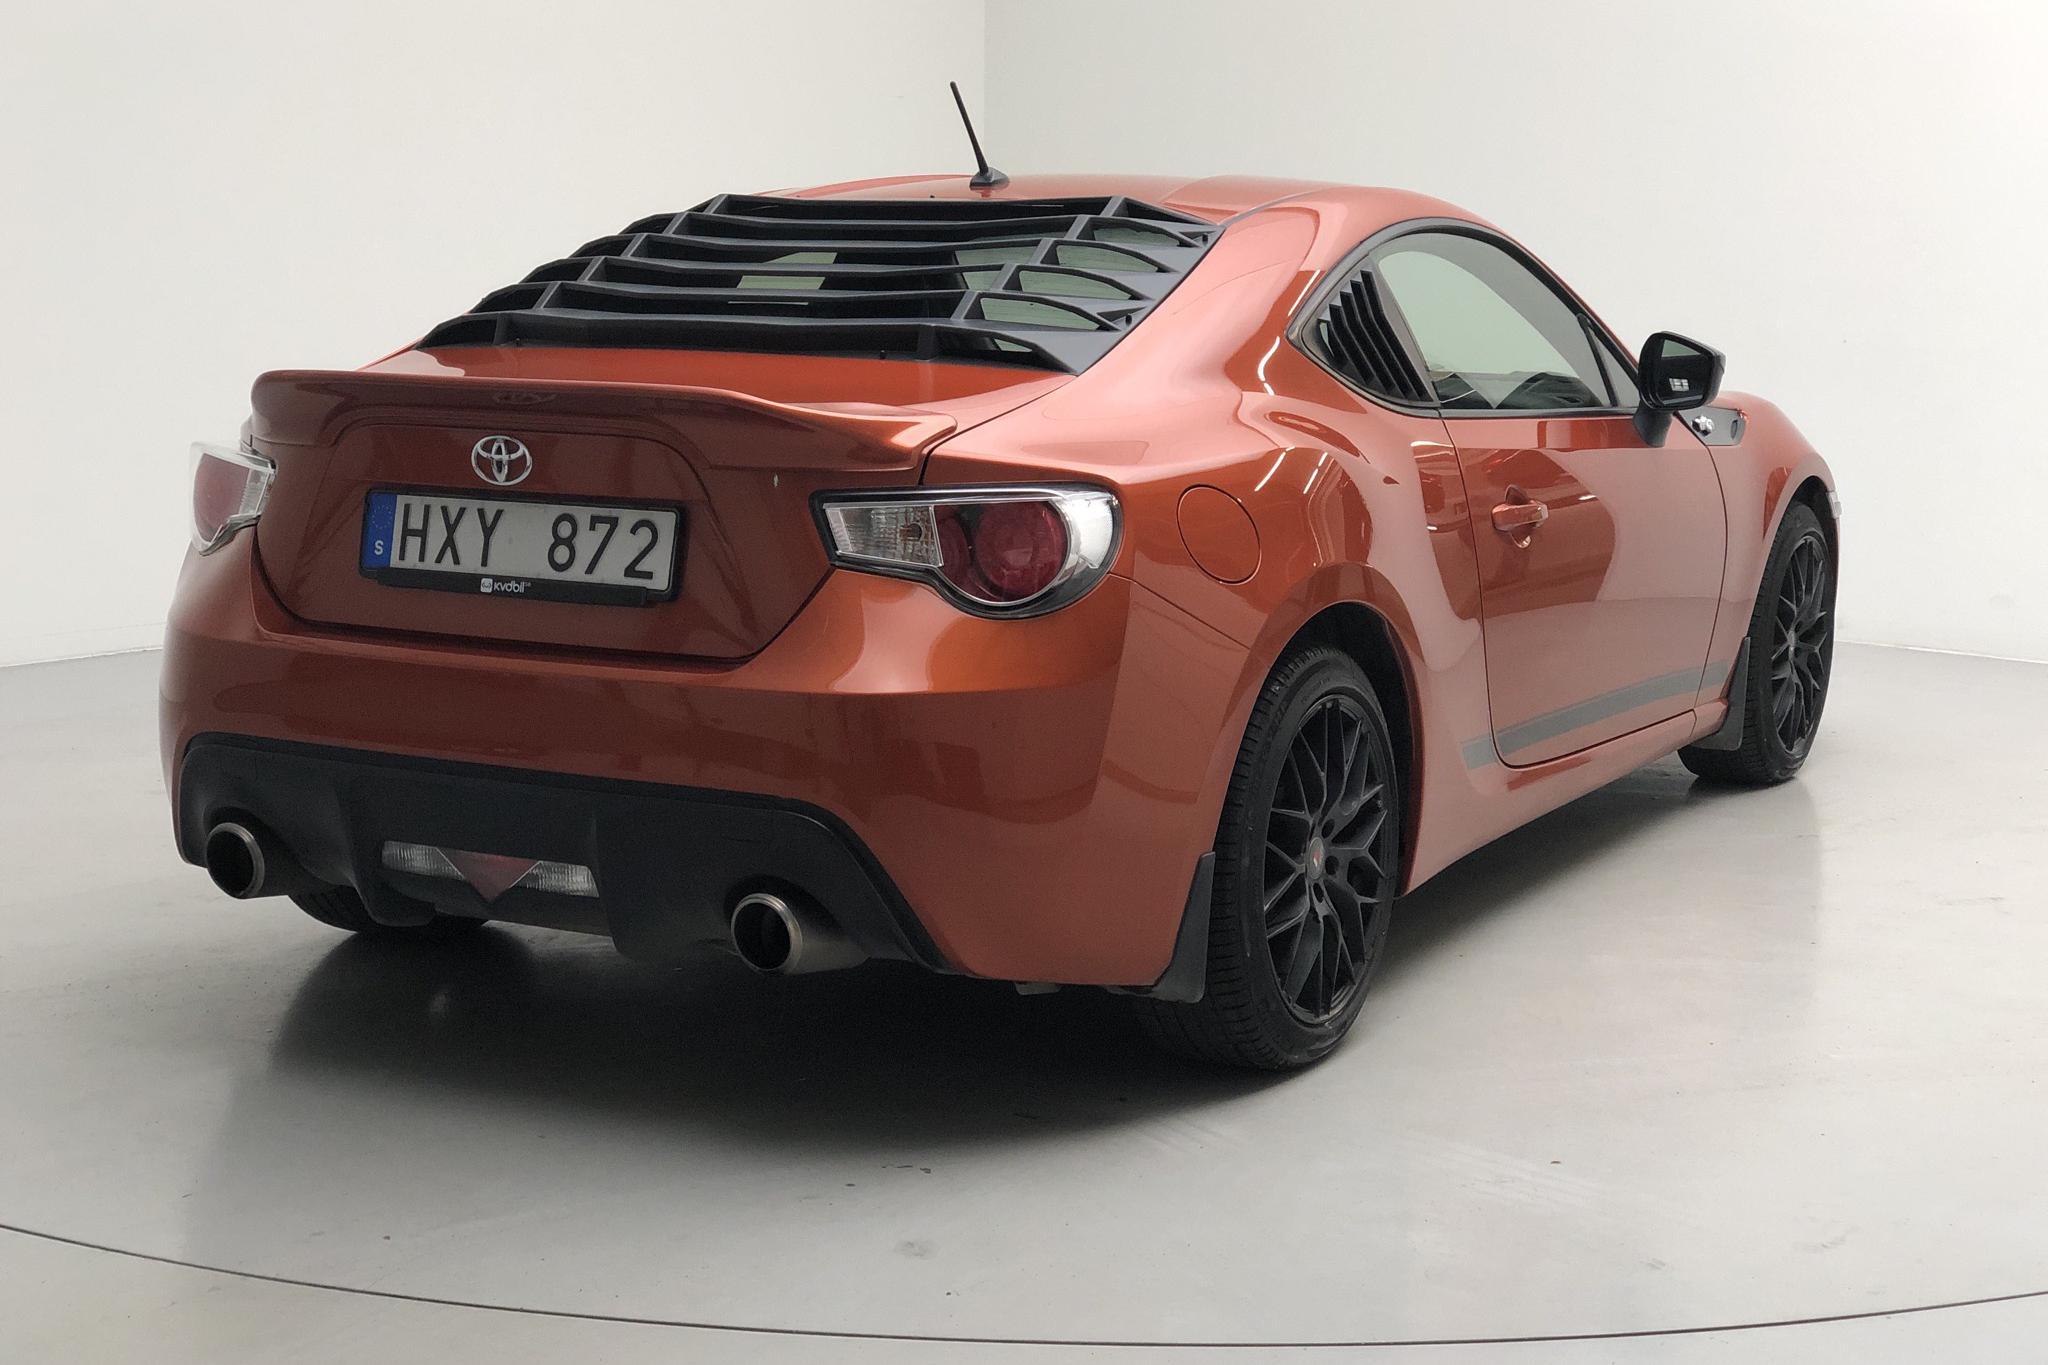 Toyota GT86 (200hk) - 80 180 km - Automatic - orange - 2012